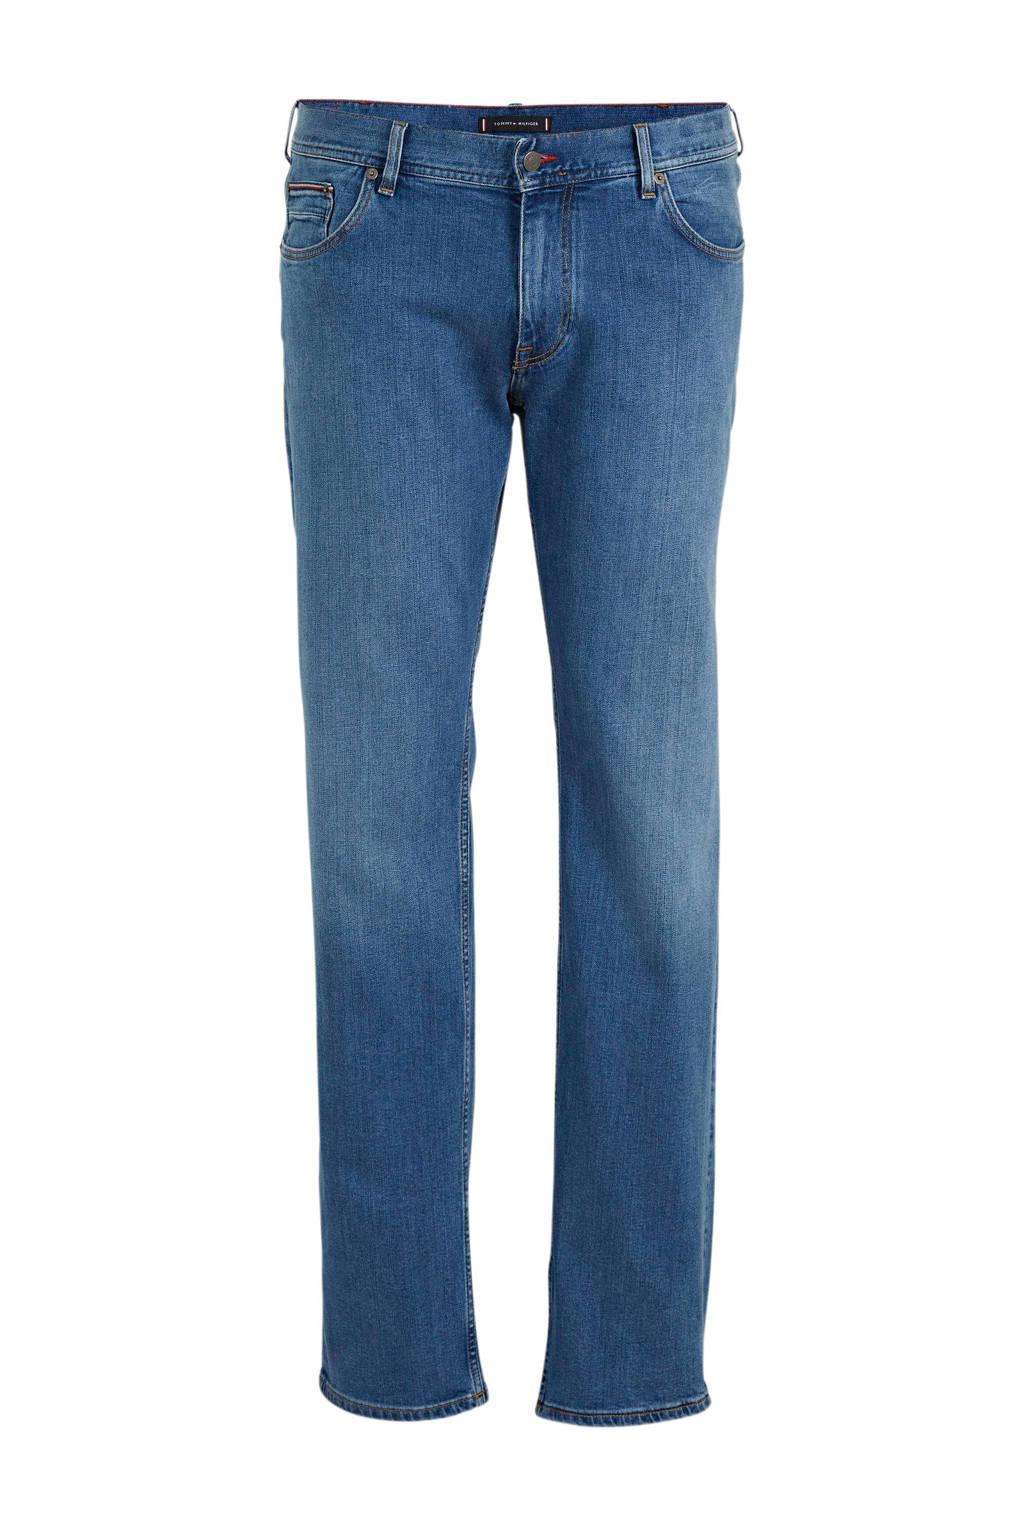 Tommy Hilfiger Big & Tall +size regular fit jeans alvin blue, Alvin Blue